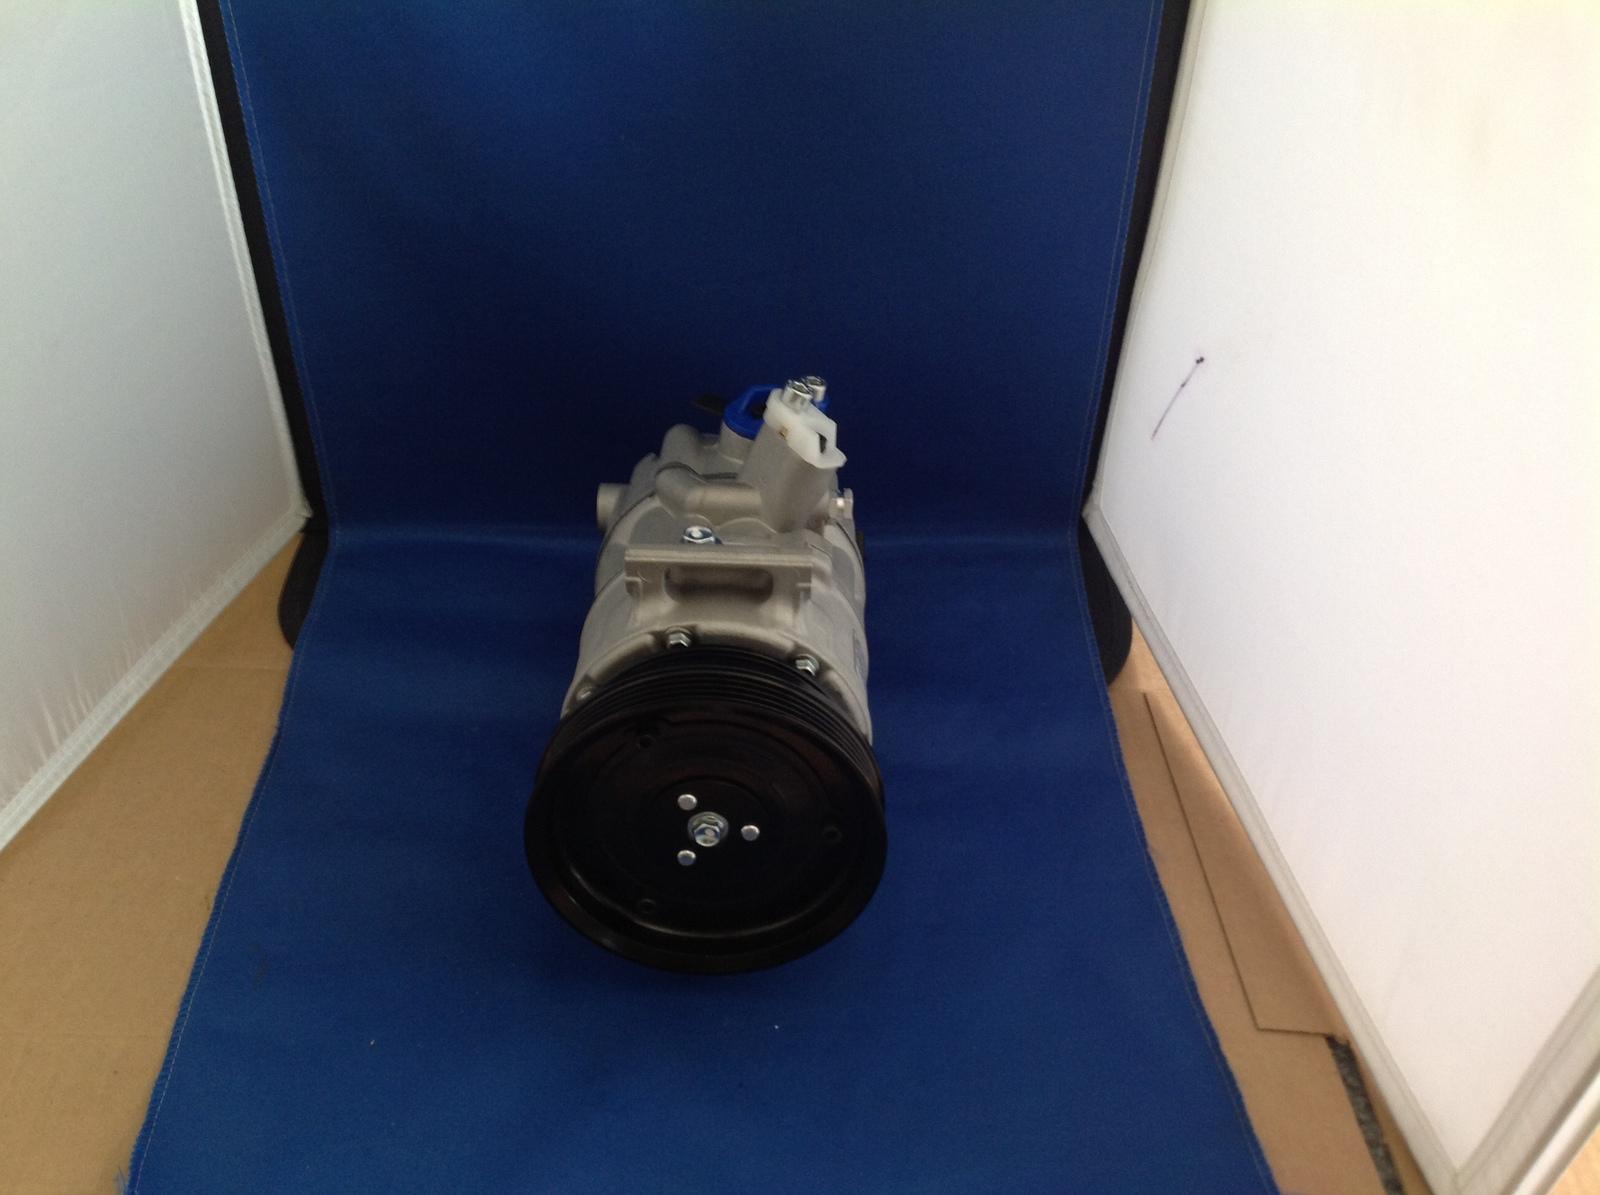 06-13 VW Volkswagen Beetle 2.0 2.5 Auto AC Air Conditioning Compressor Part